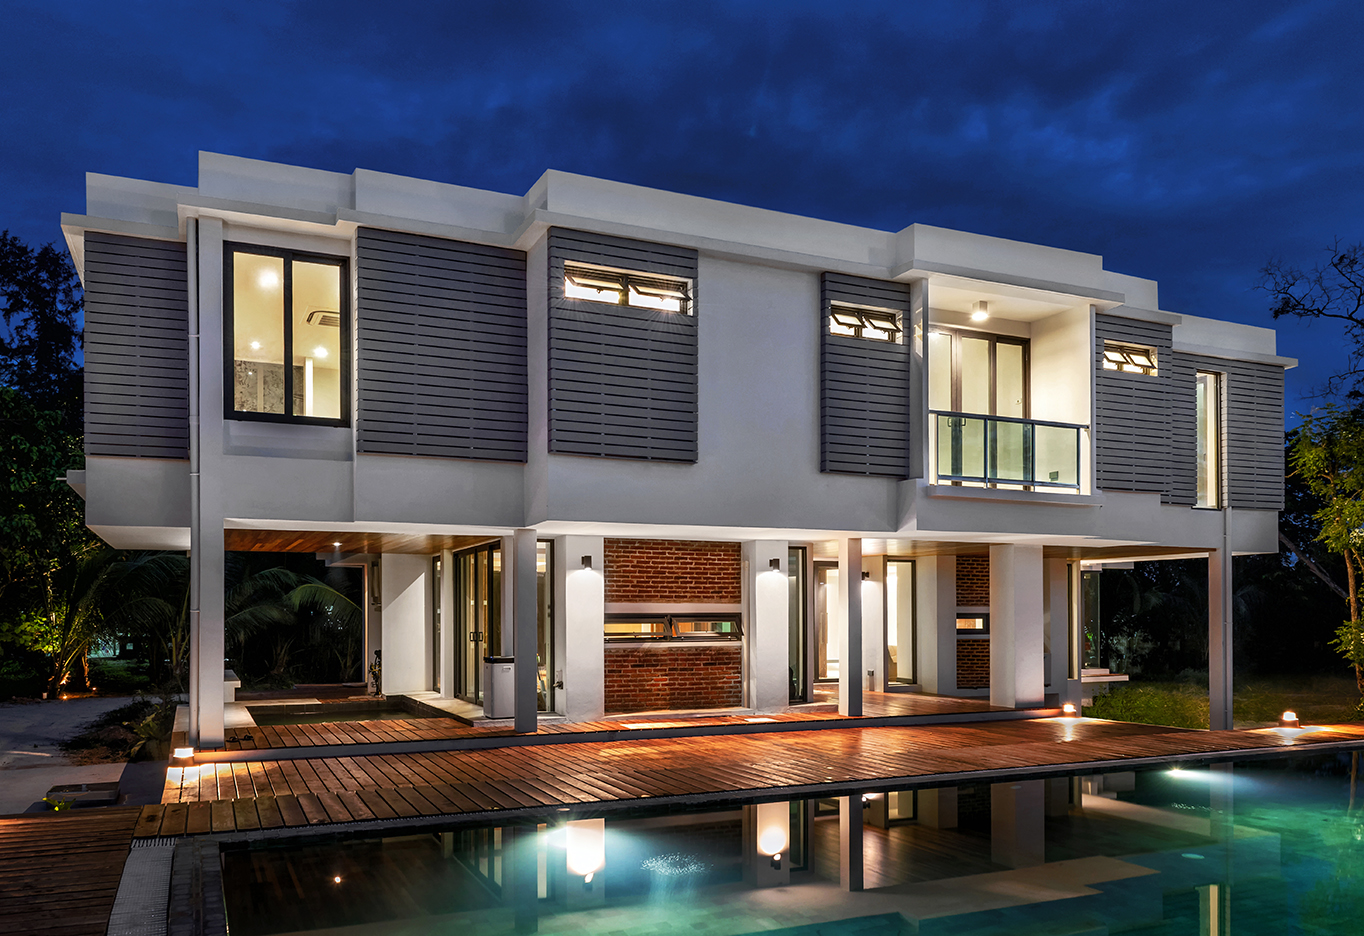 10design uthai residence house design modern architecture pattani thailand swimming pool 08